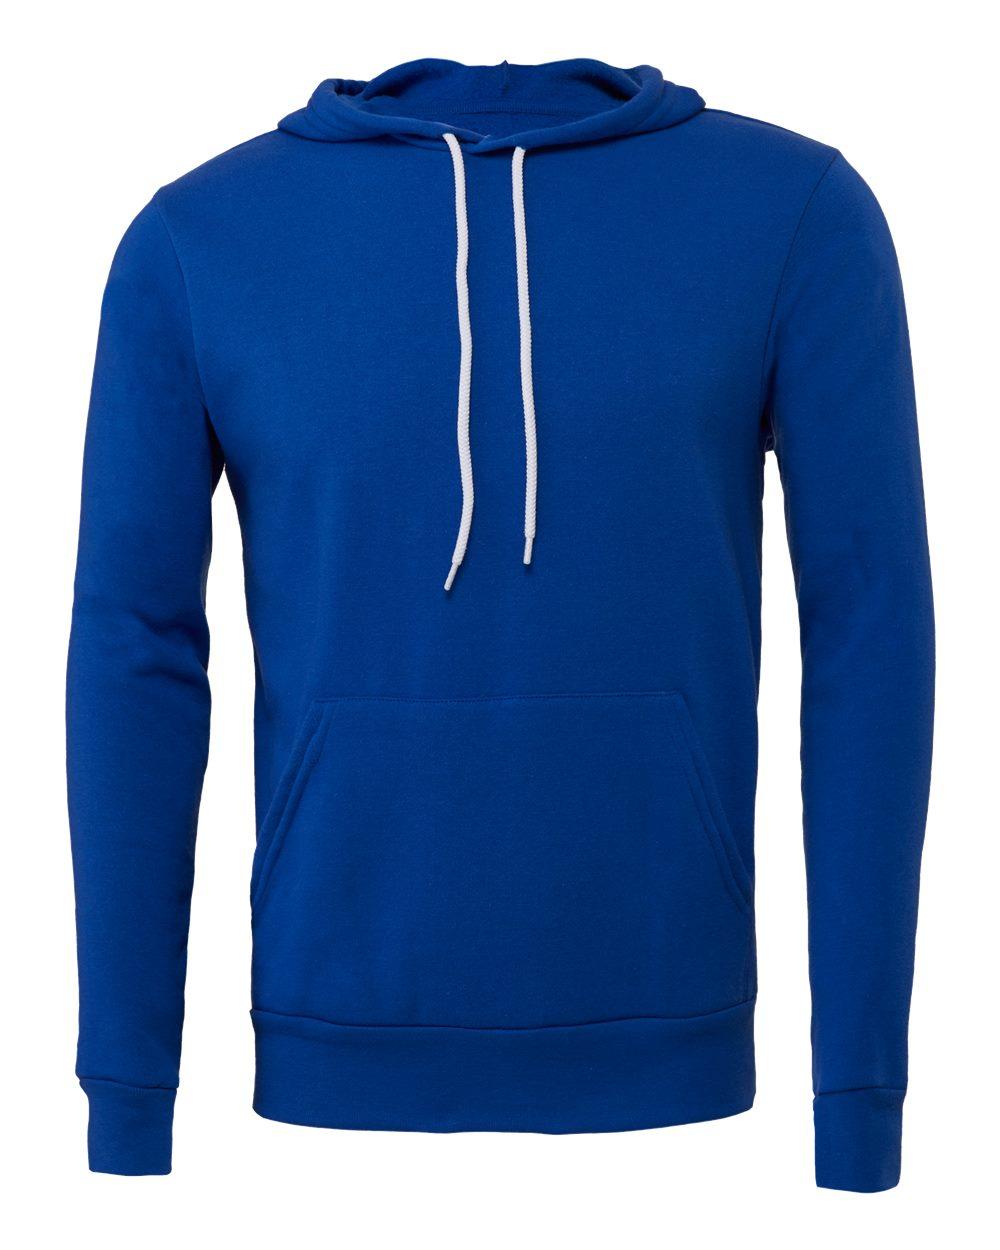 Bella-Canvas-Unisex-Sponge-Hooded-Pullover-Sweatshirt-Blank-3719-up-to-2XL thumbnail 98